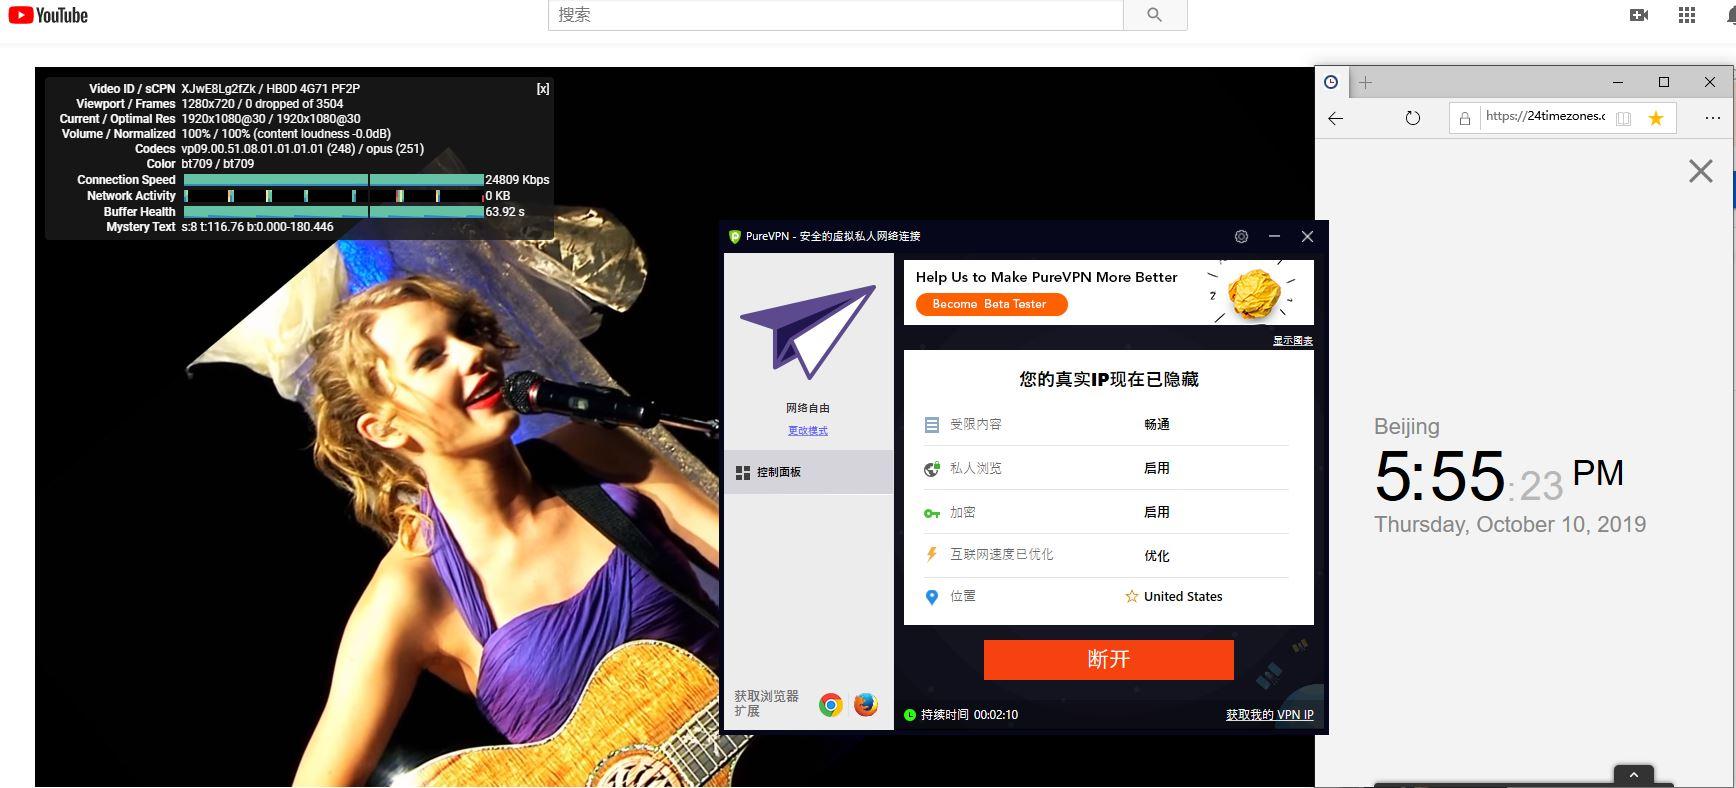 Windows PureVPN United States 中国VPN翻墙 科学上网 Youtube测速-20191010